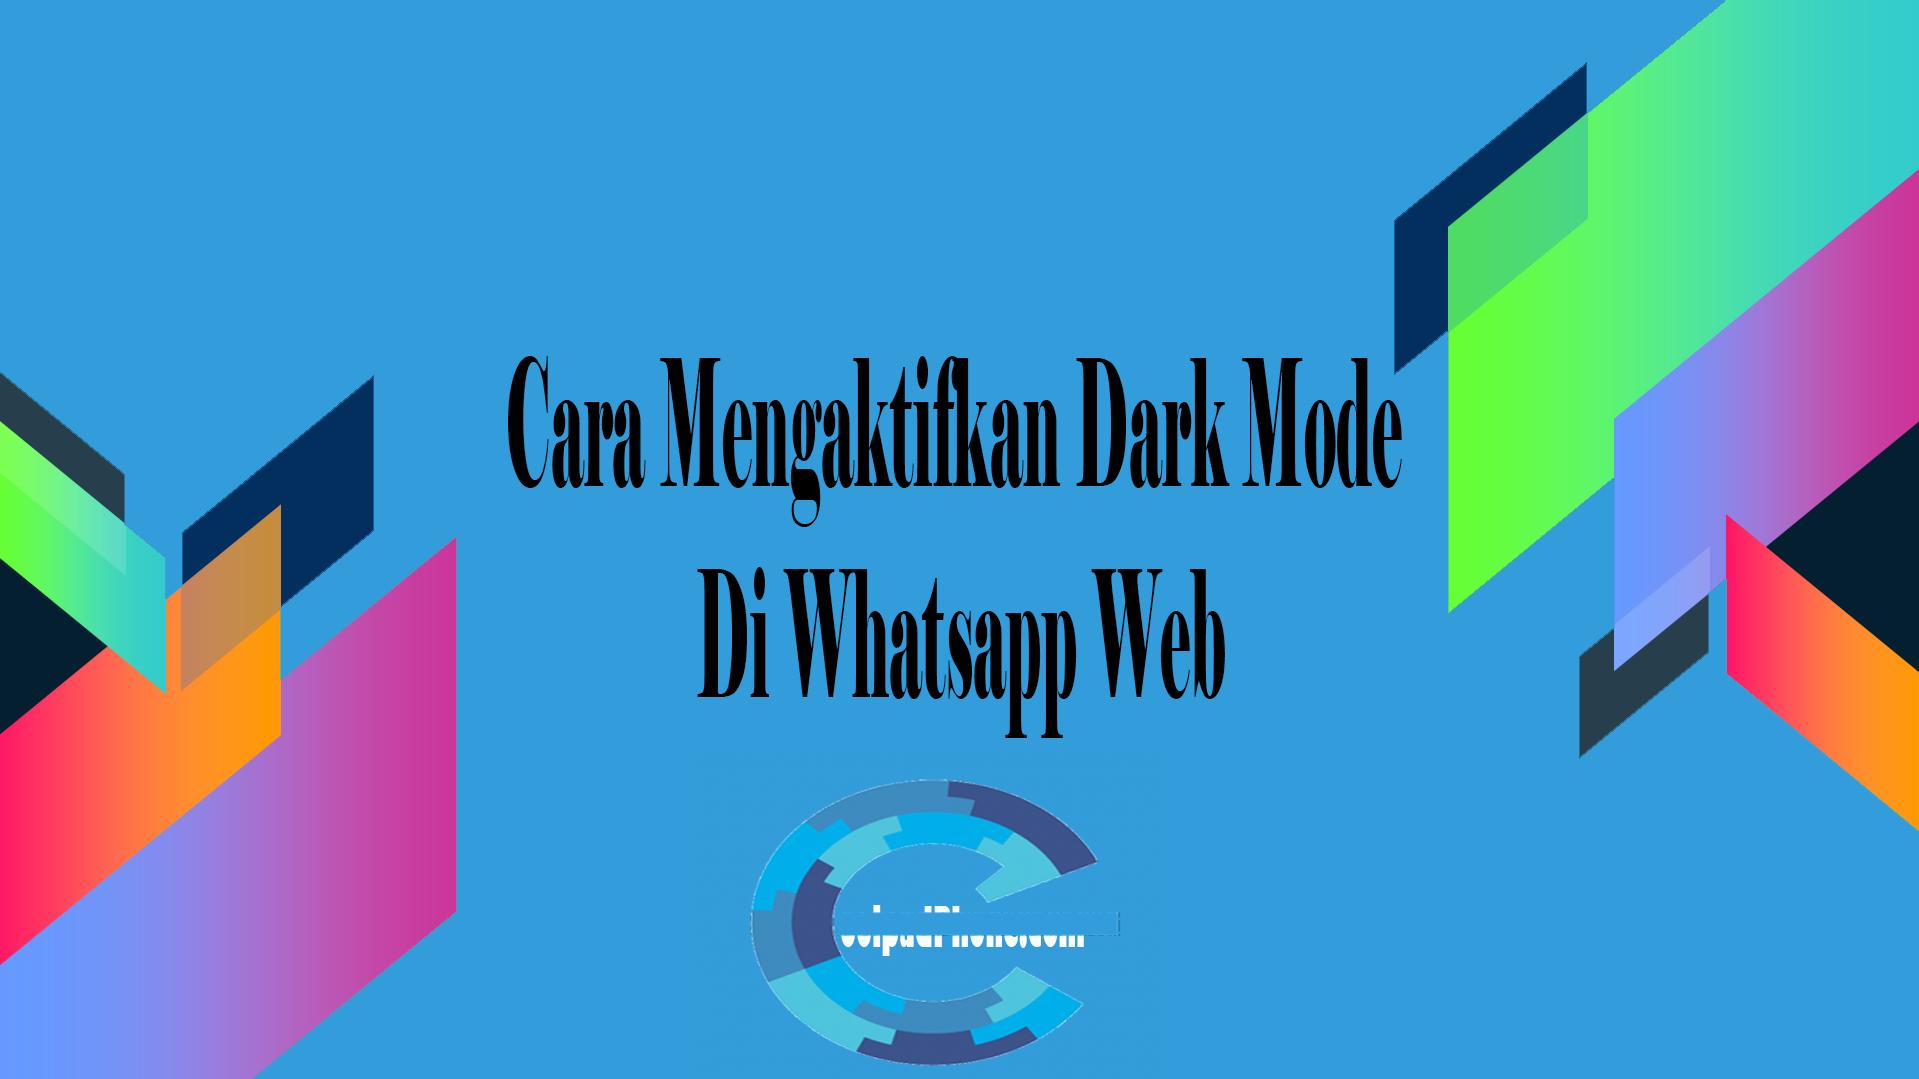 Cara Mengaktifkan Dark Mode Di Whatsapp Web